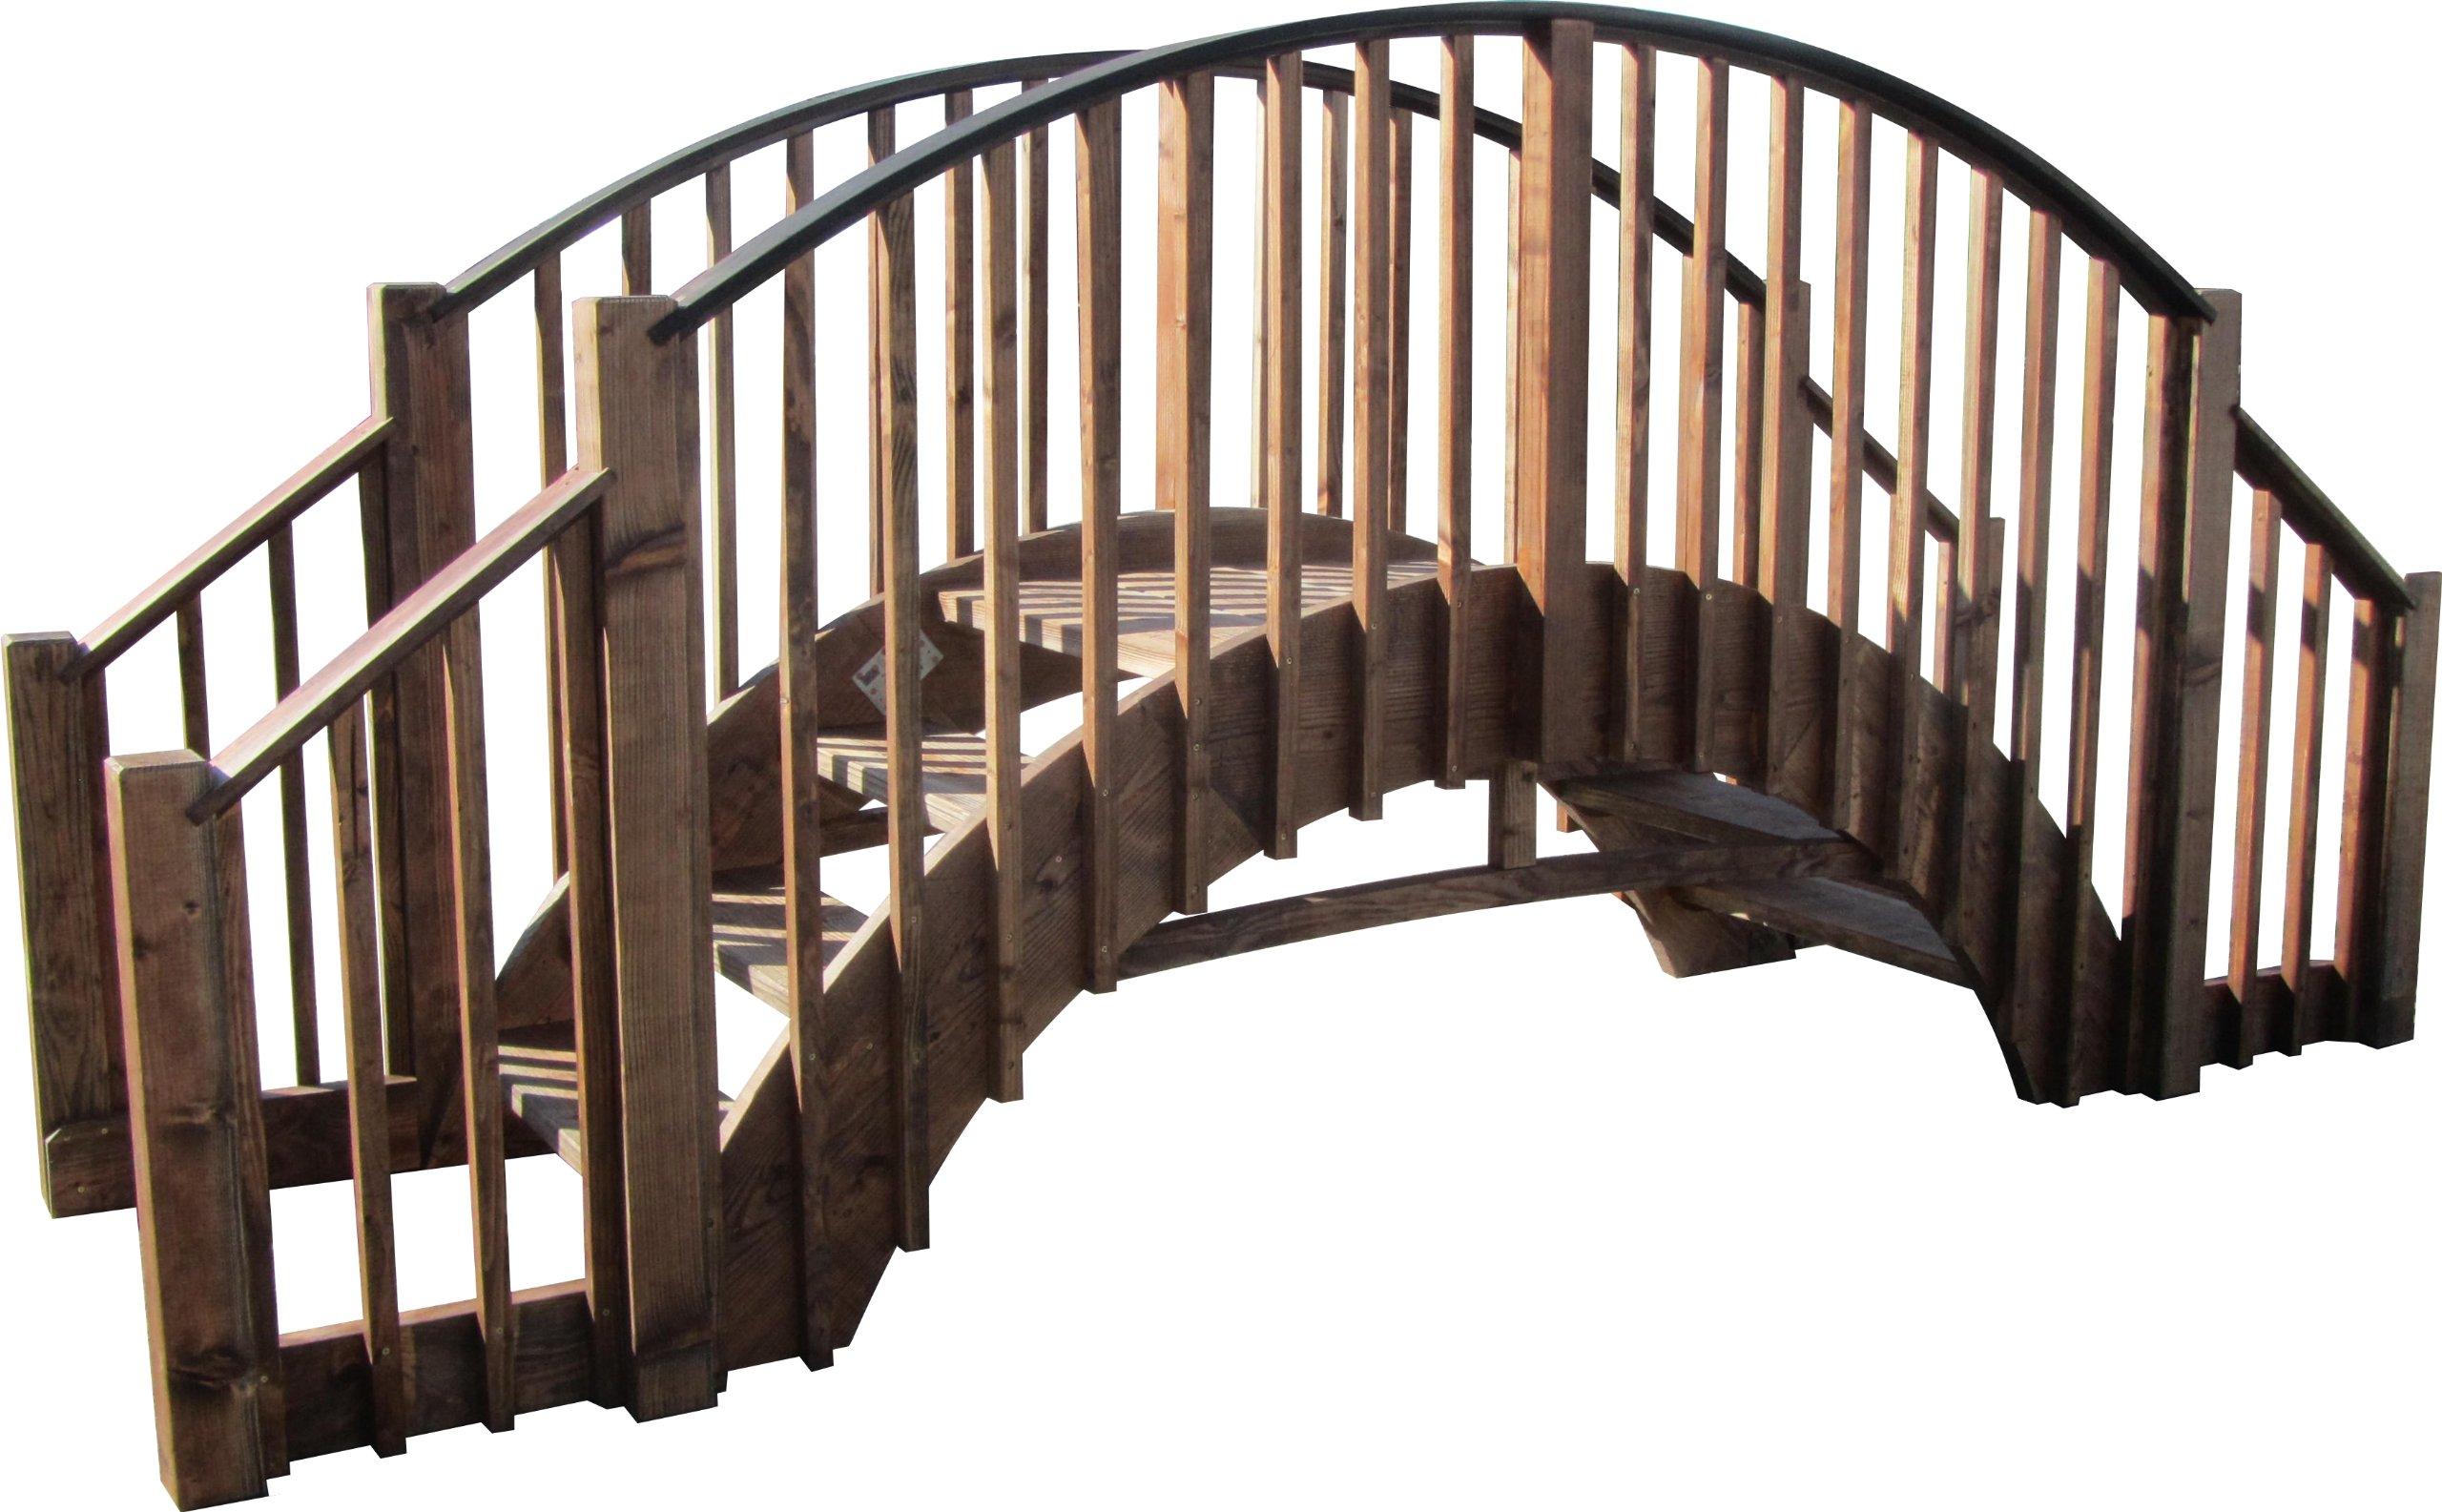 SamsGazebos 8' Japanese Wood Garden Bridge with 4 Extended Railings, Treated by SamsGazebosTM